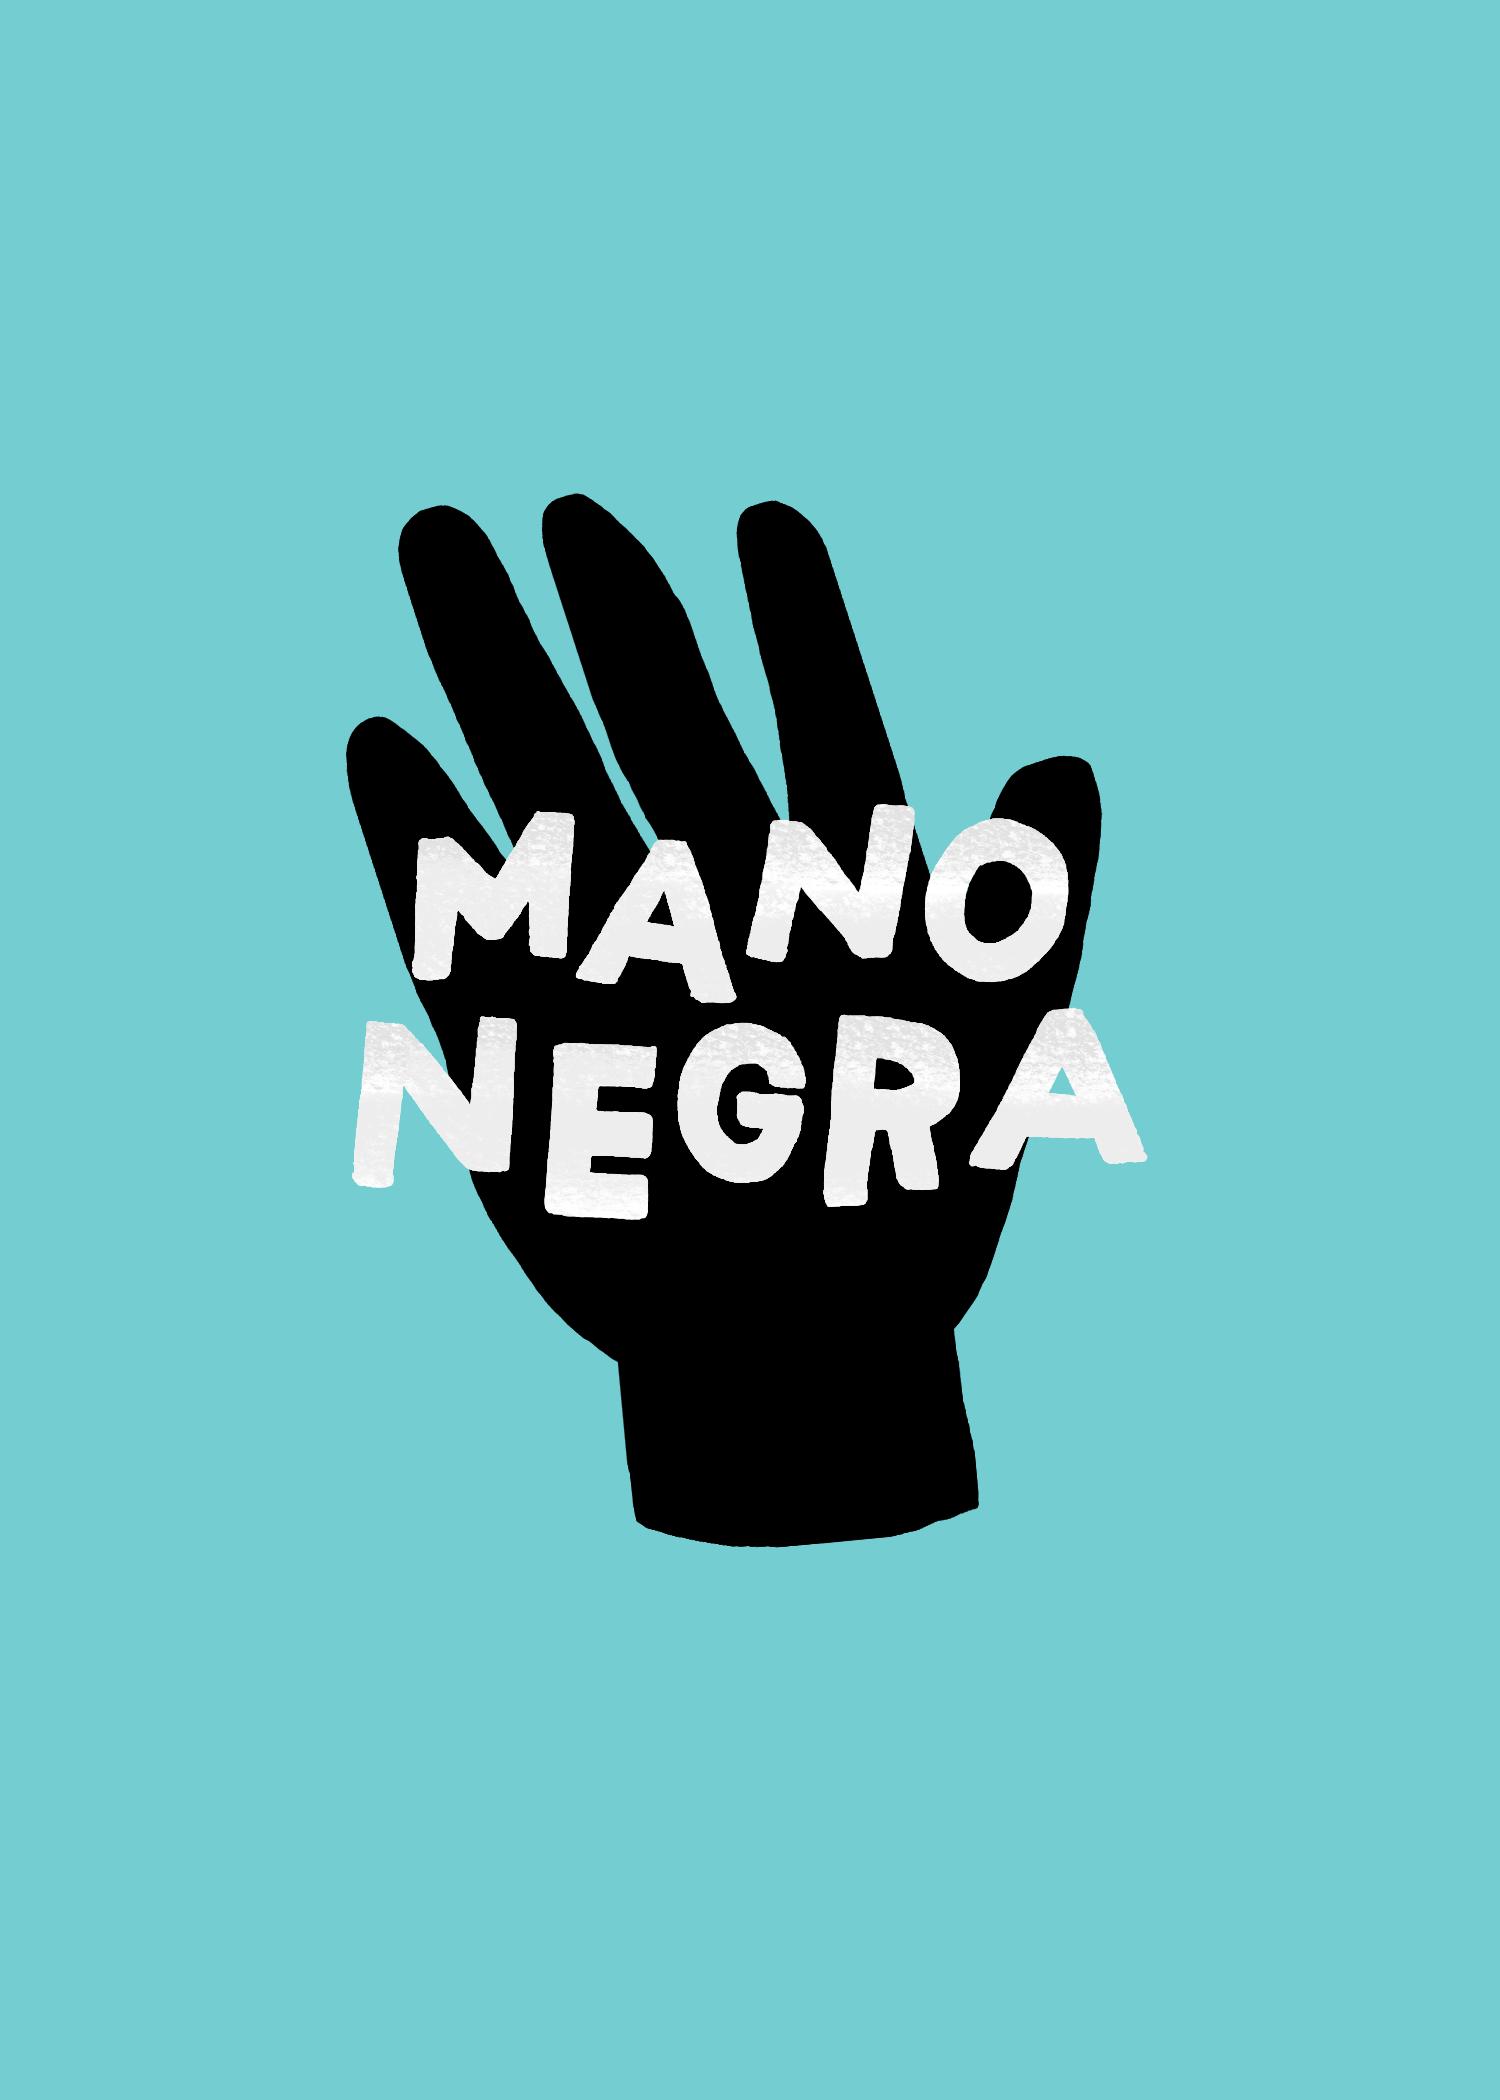 15.ManoNegra.png